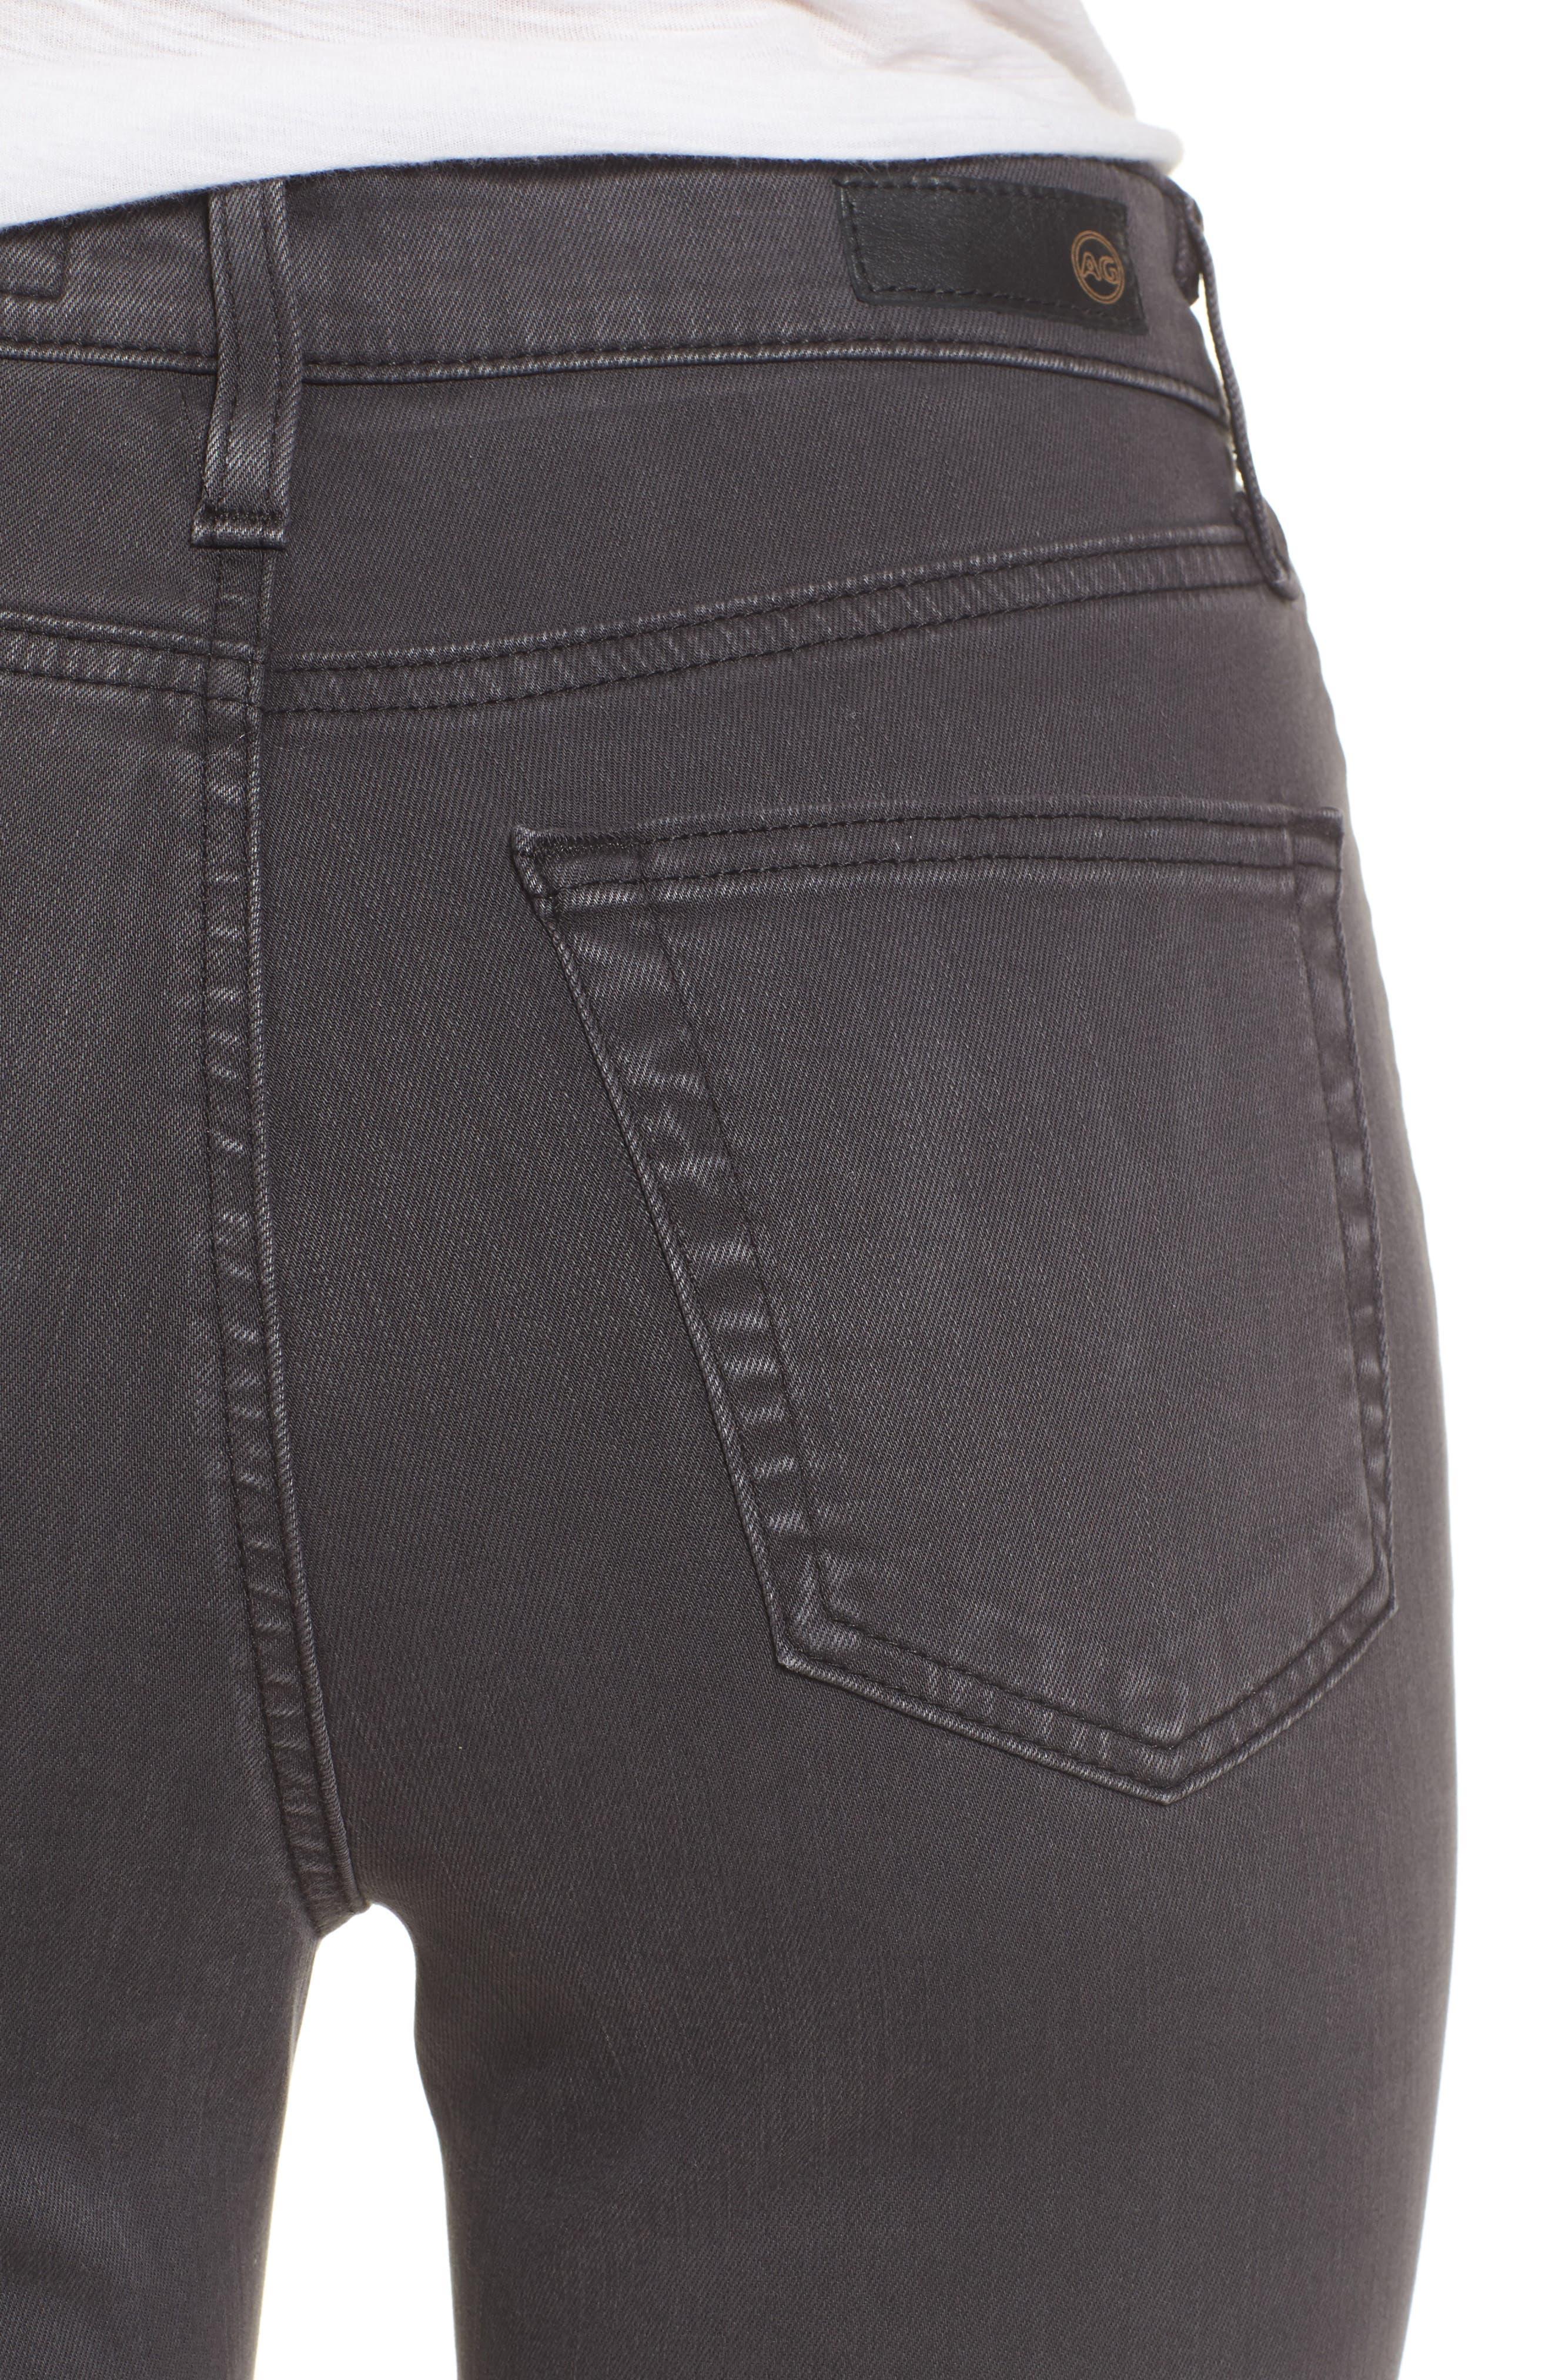 Mila High Rise Skinny Jeans,                             Alternate thumbnail 4, color,                             Interstellar Black